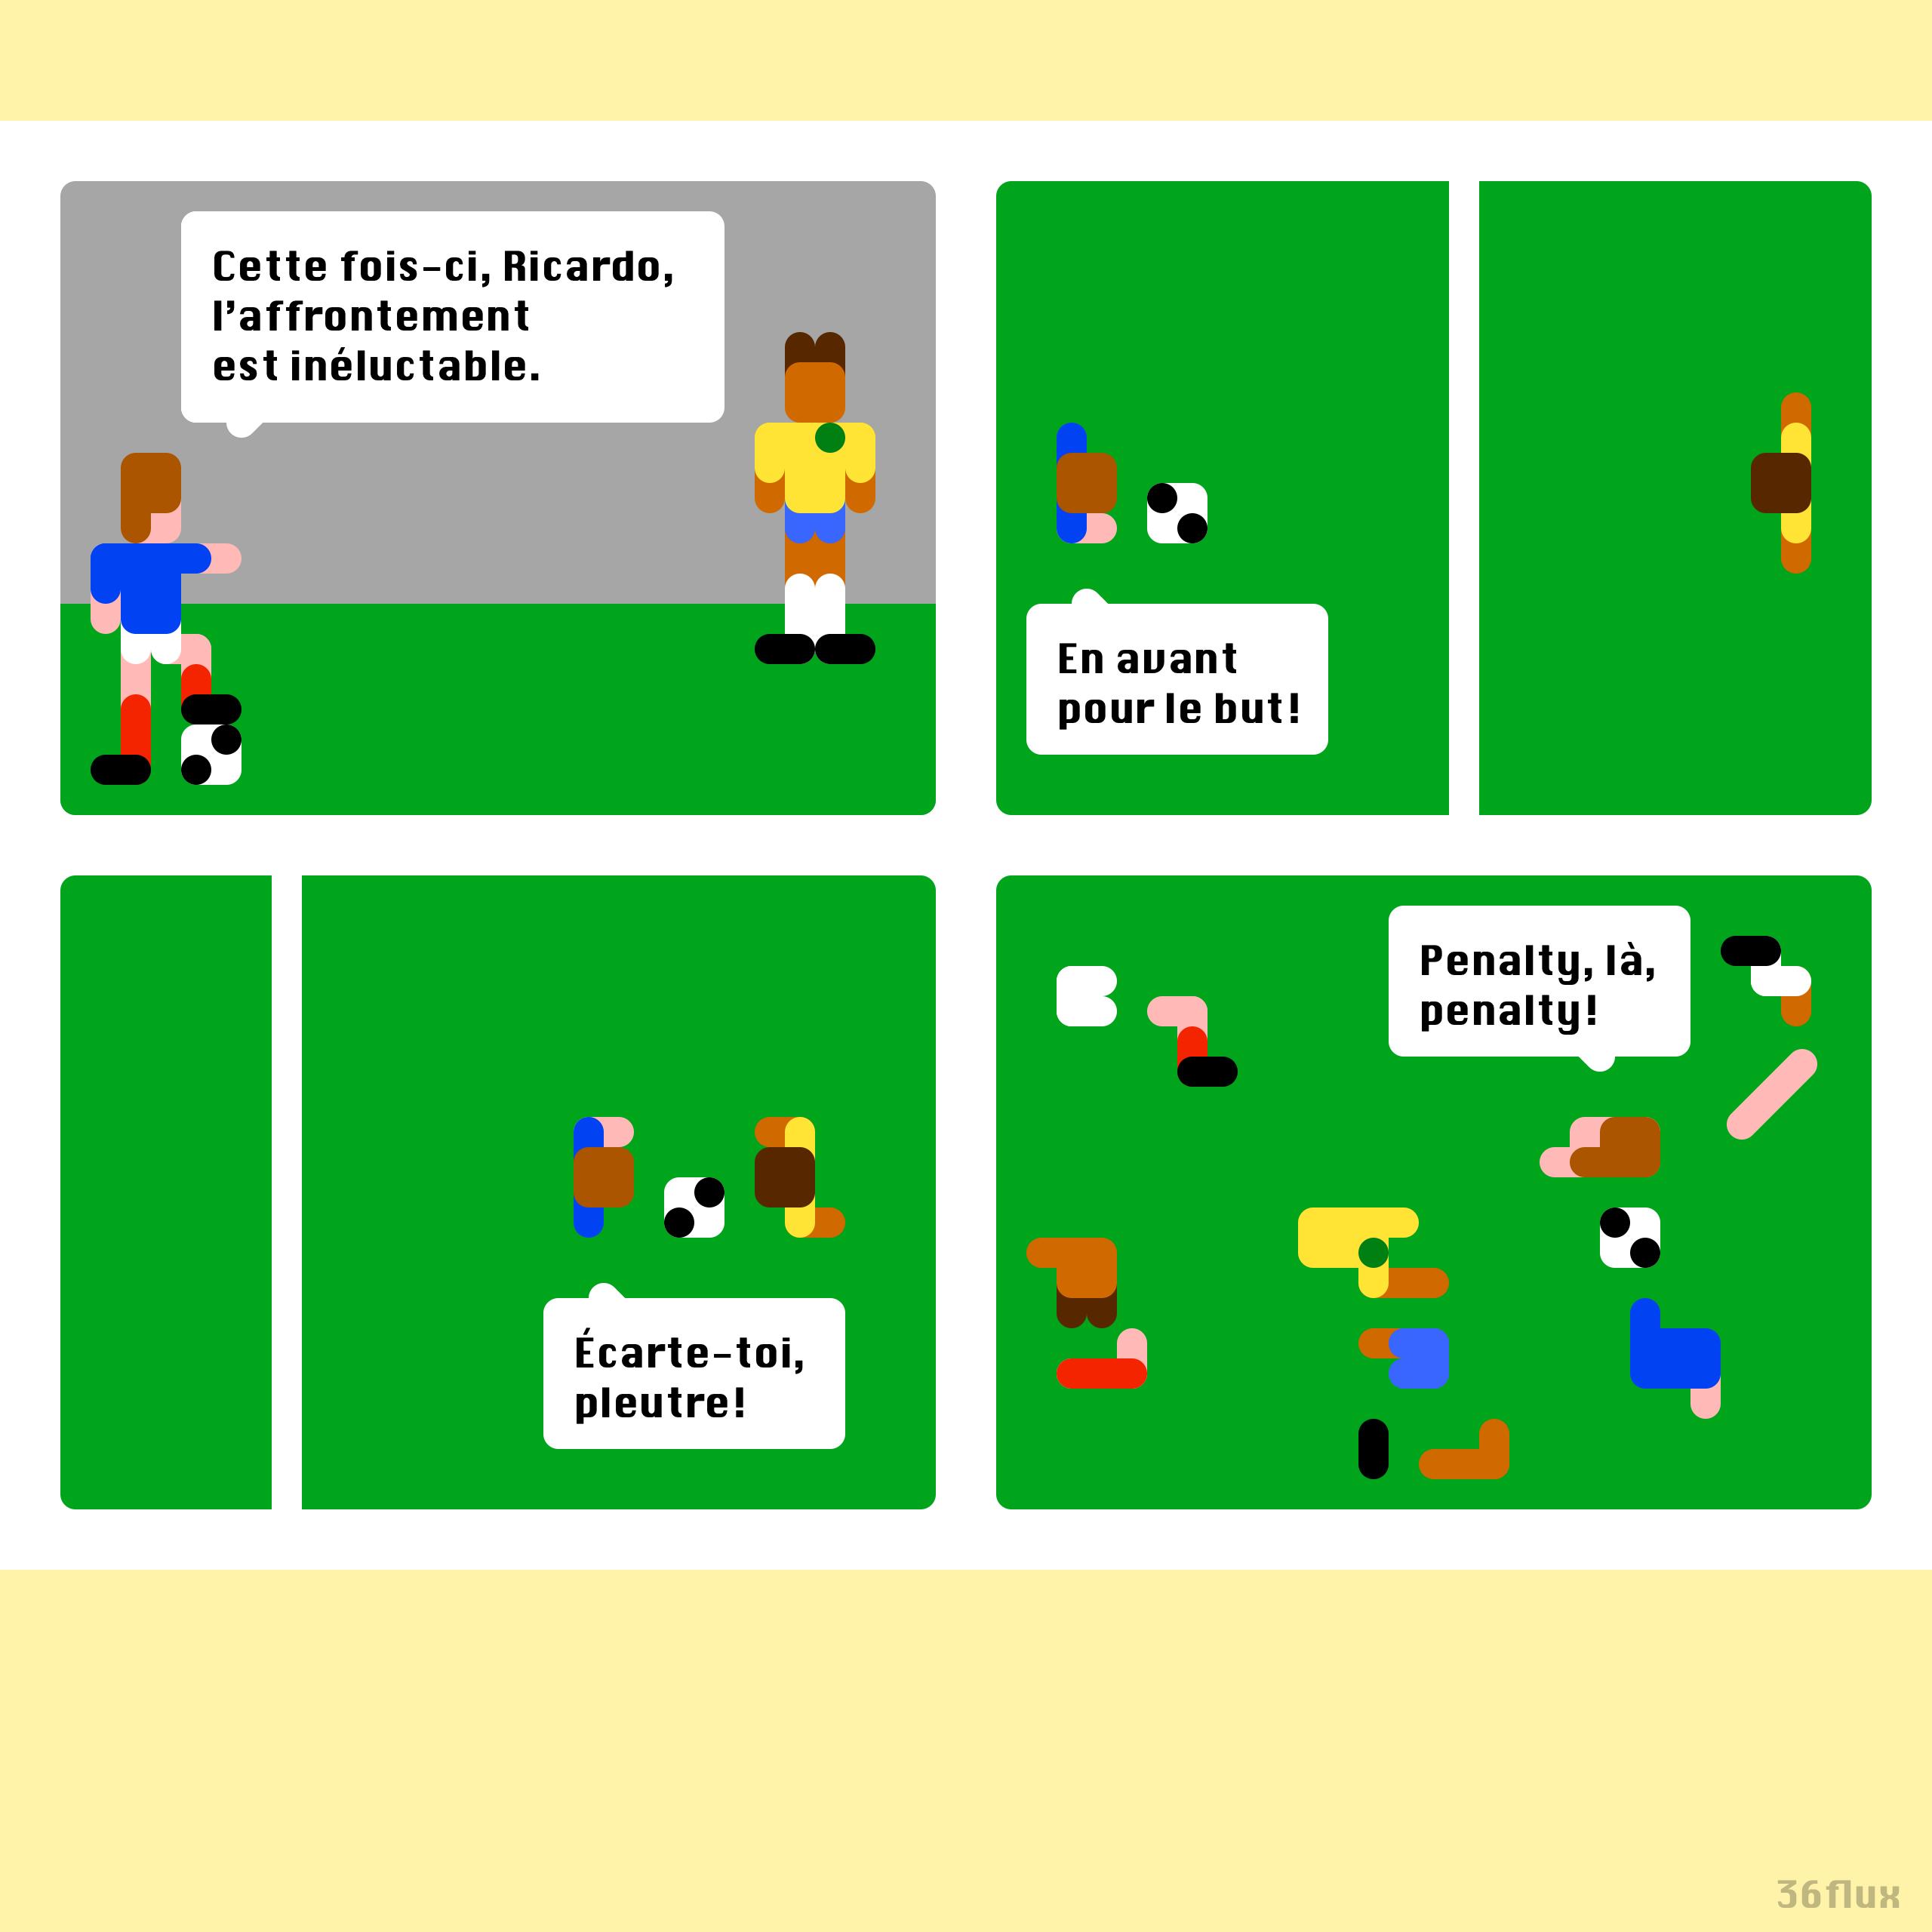 webcomics football